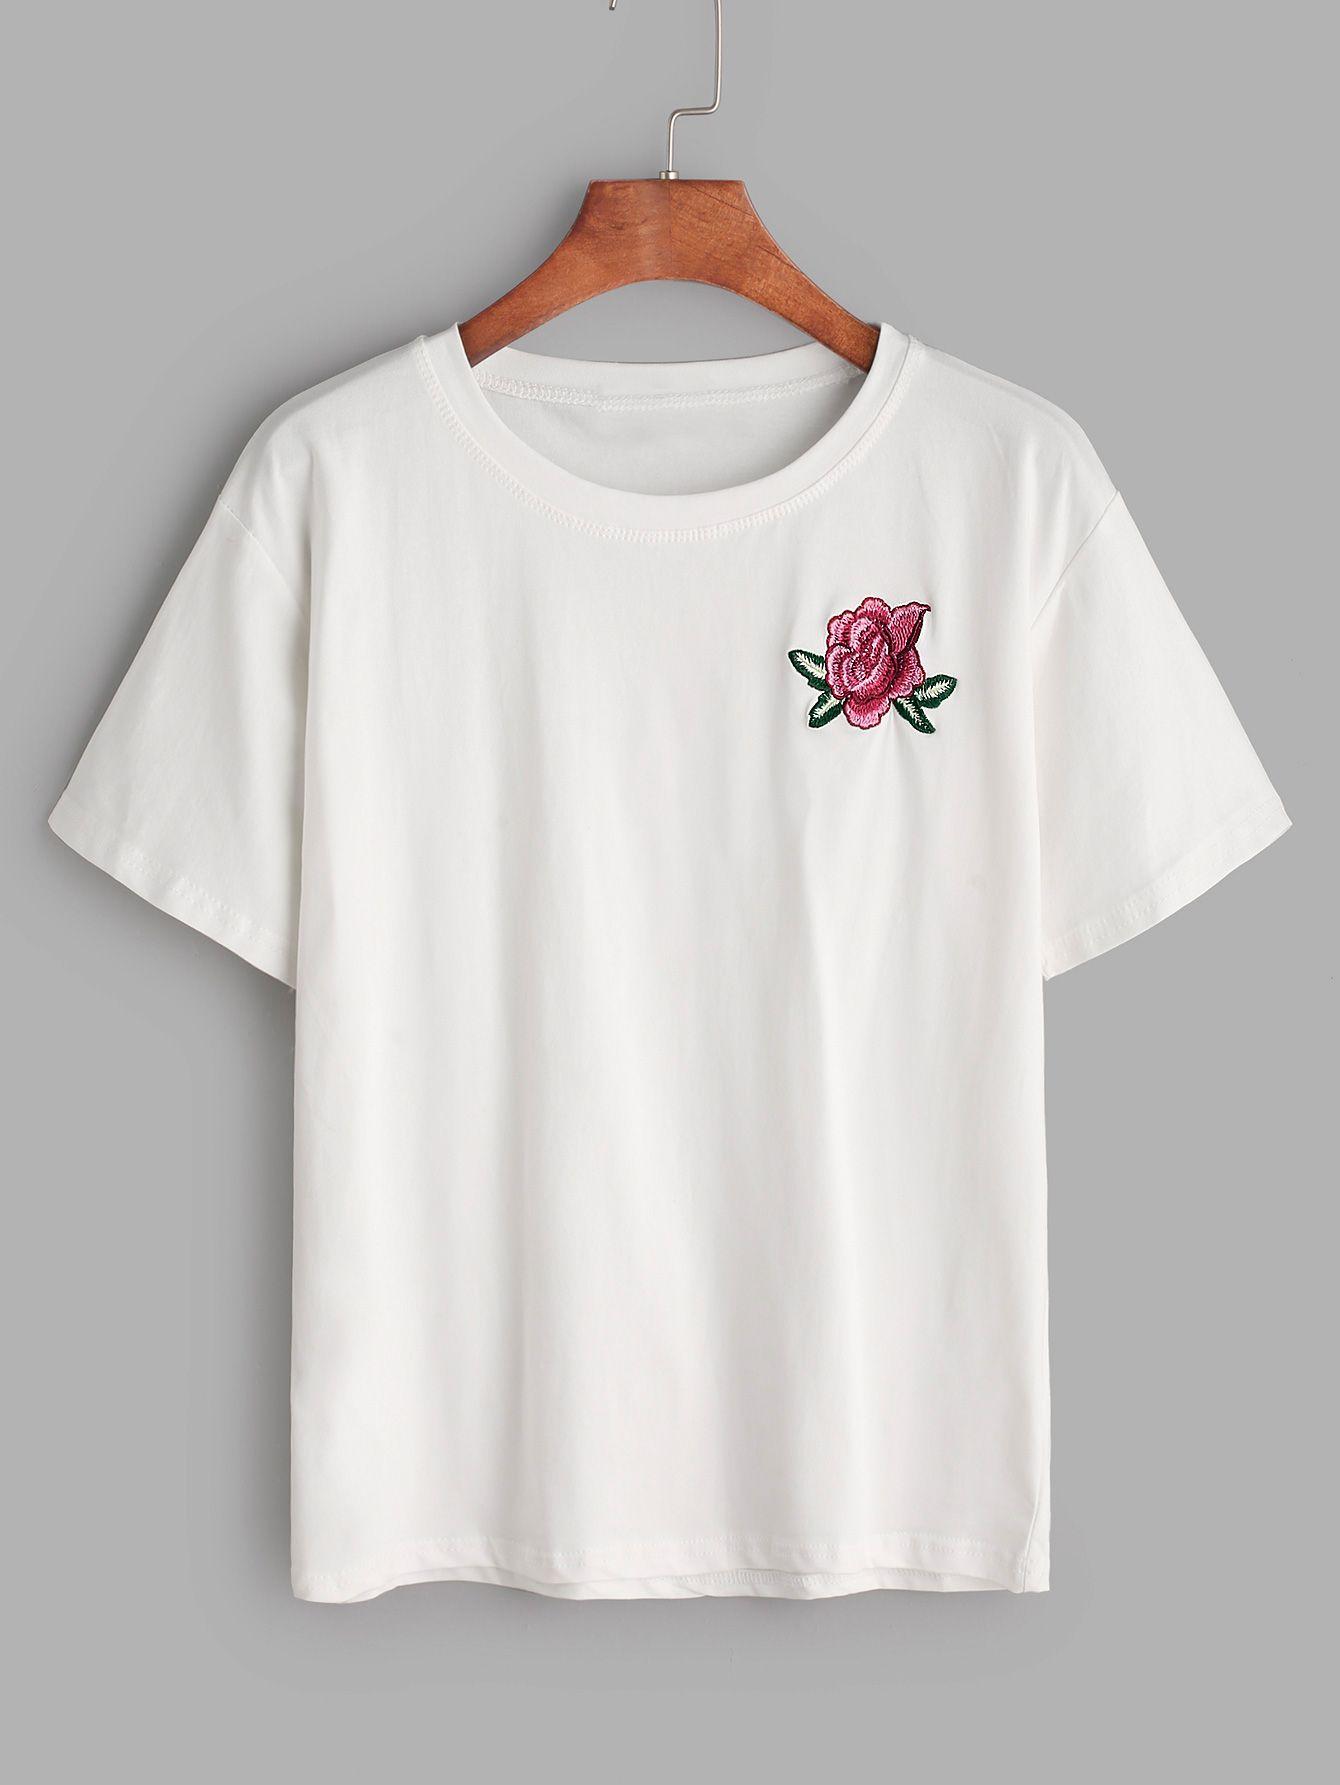 Cotton Linen Mandarin Collar Floral Embroidered Shirt - WHITE 2XL